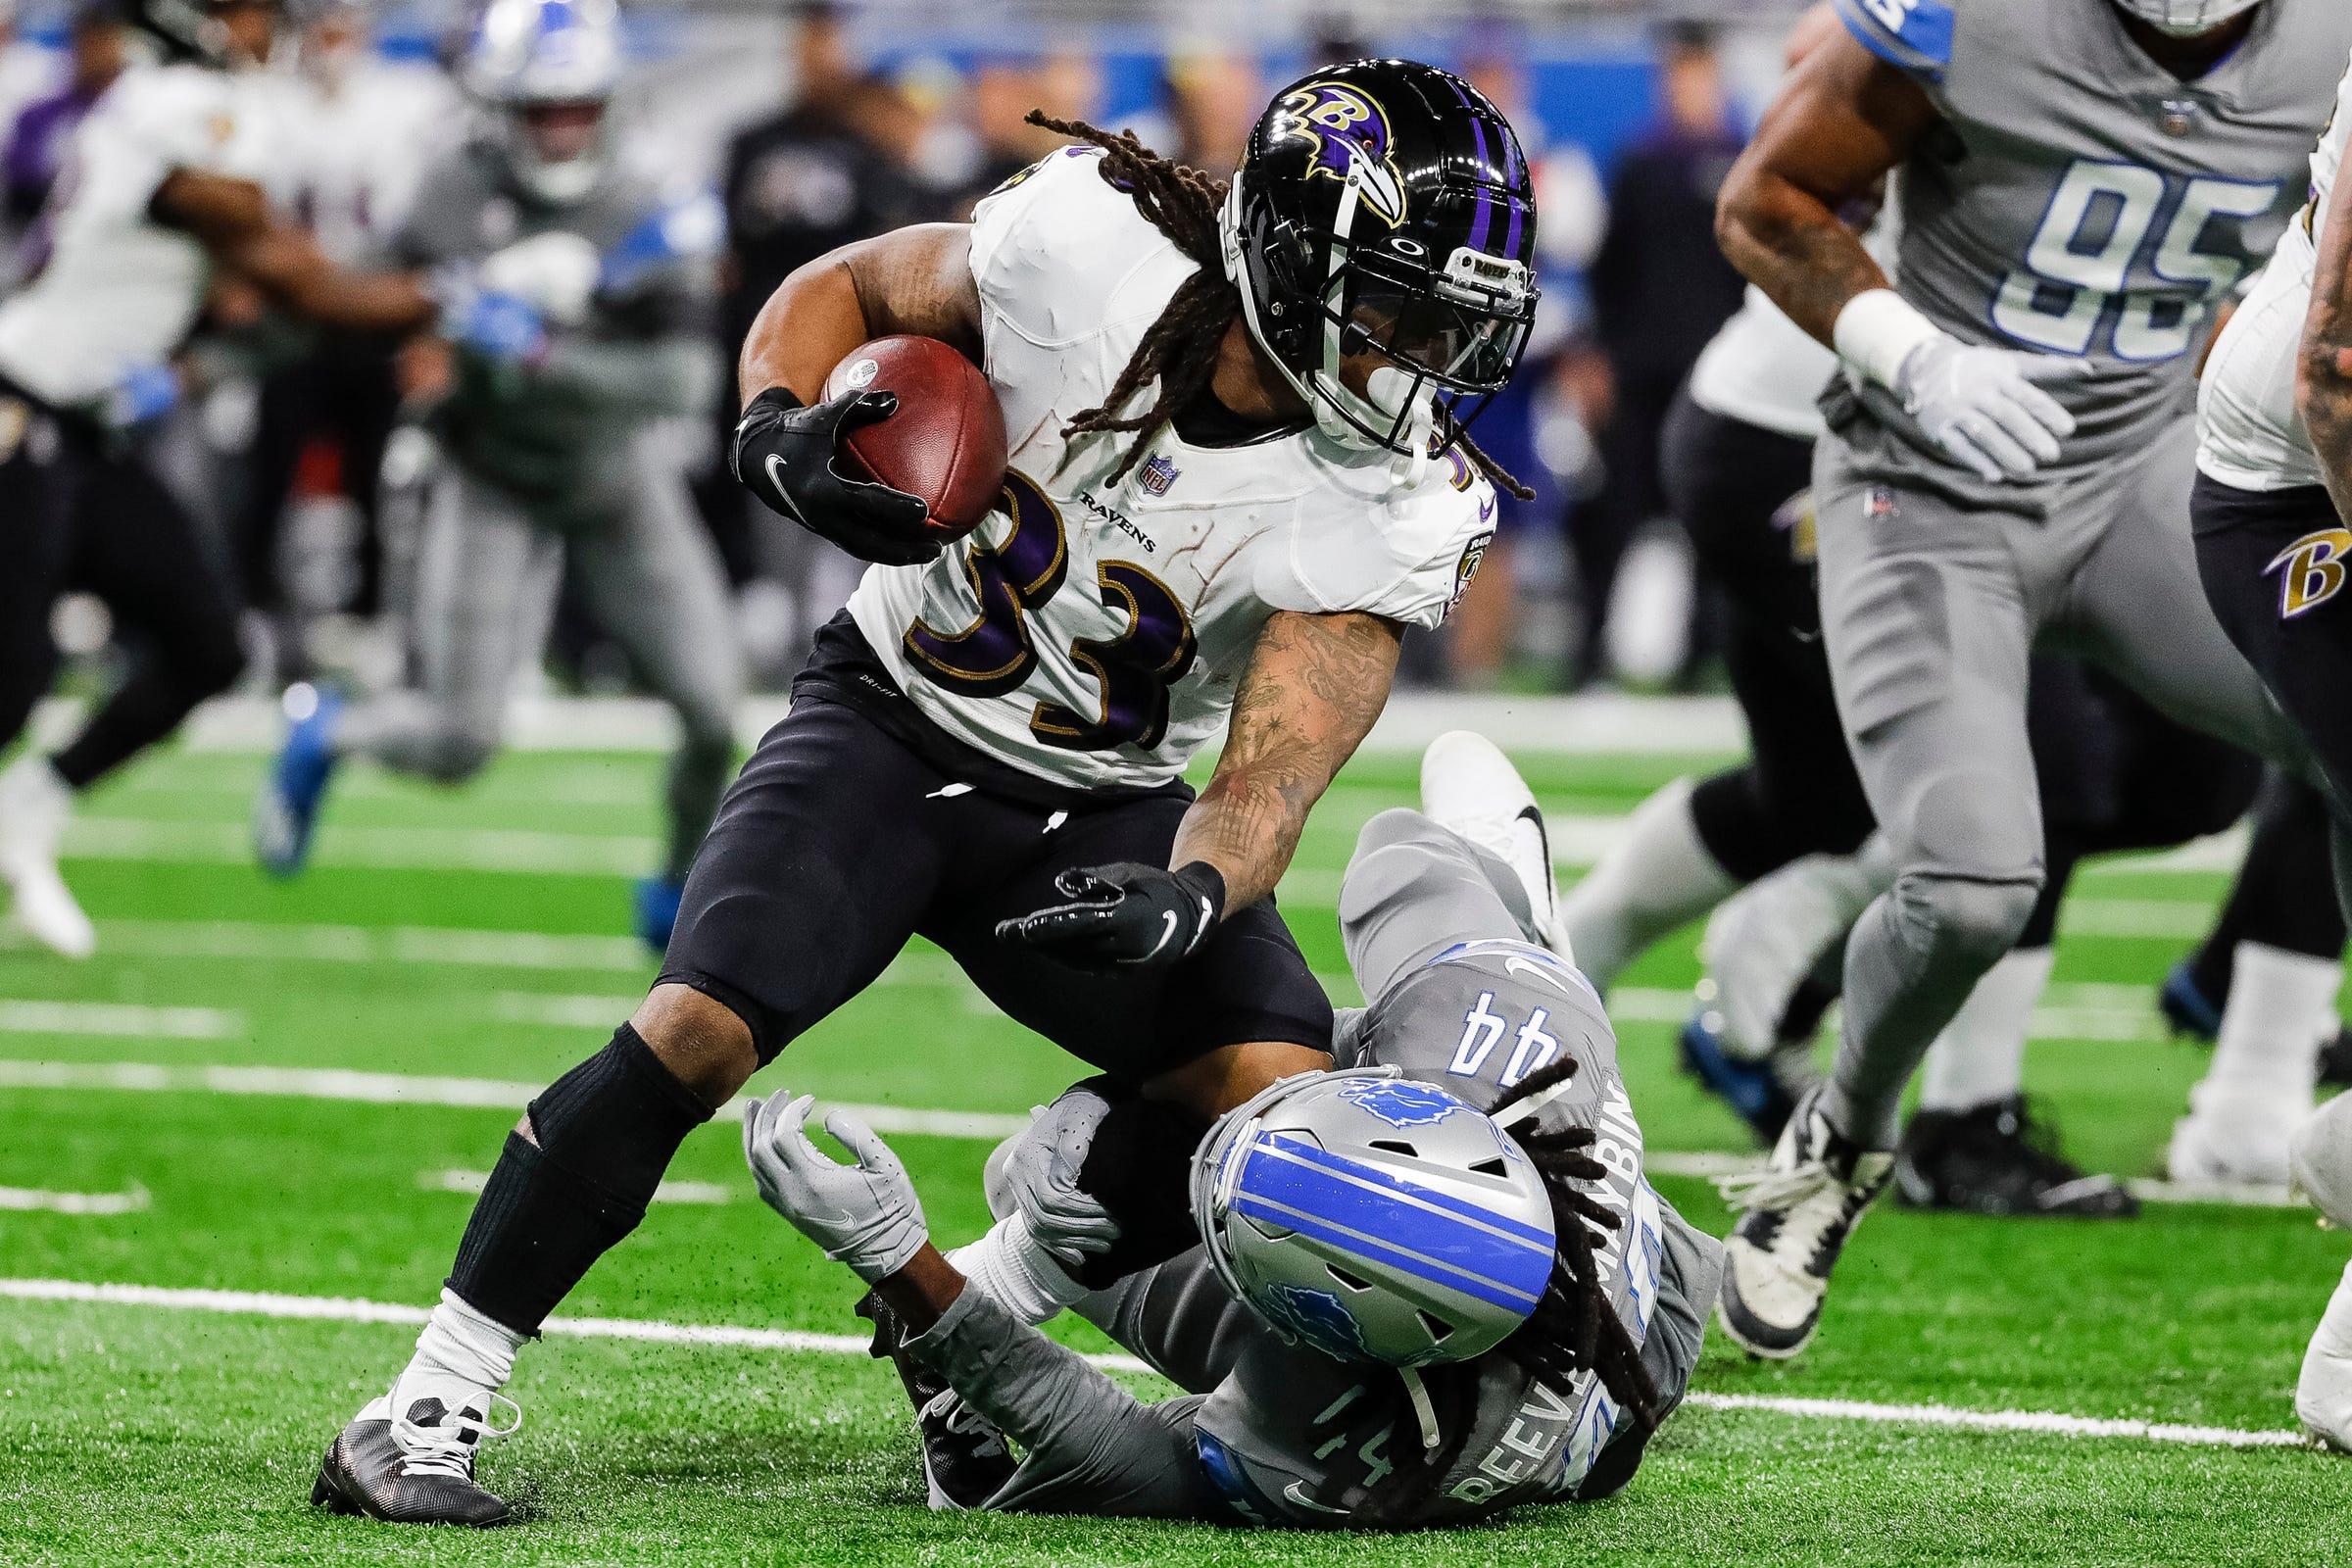 NFL: Baltimore Ravens at Detroit Lions